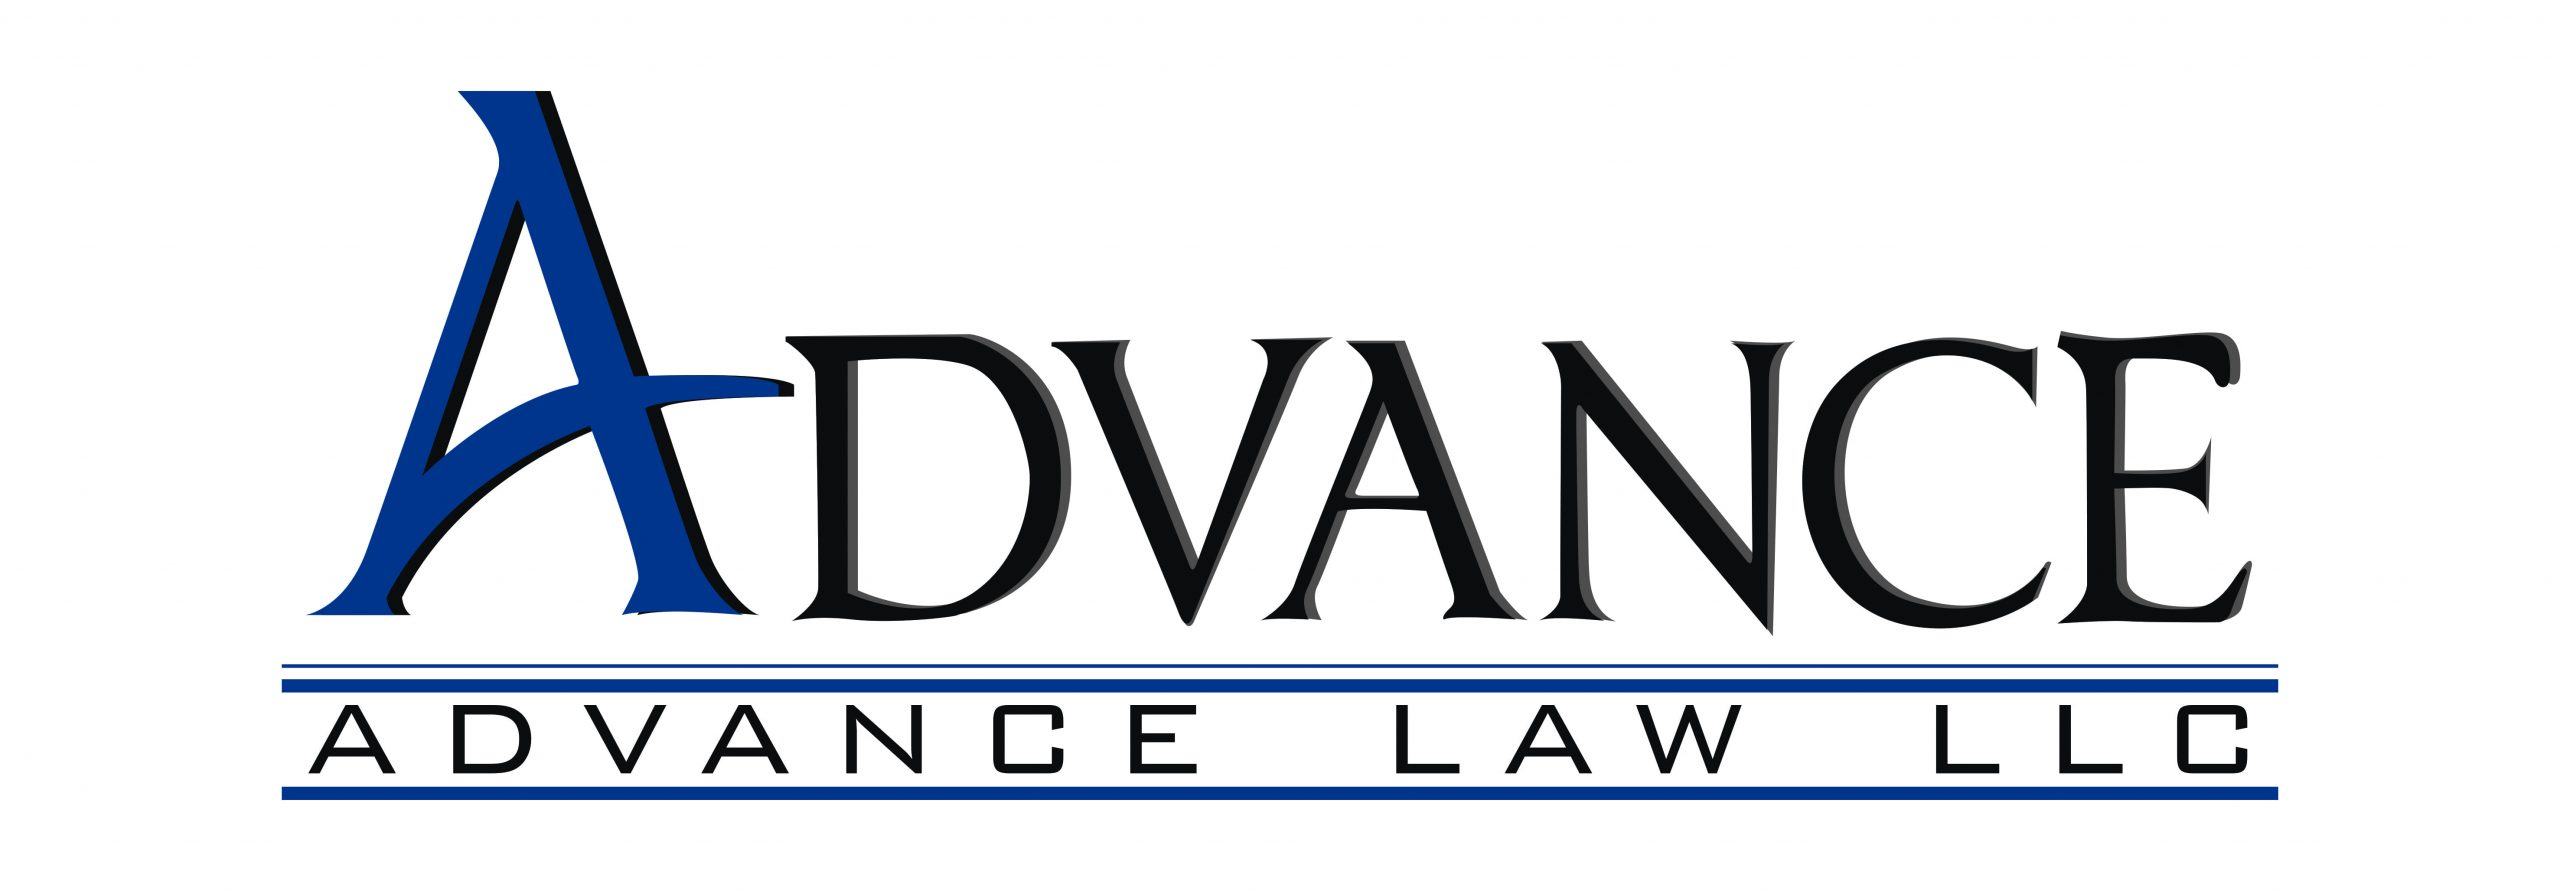 Advance Law LLC